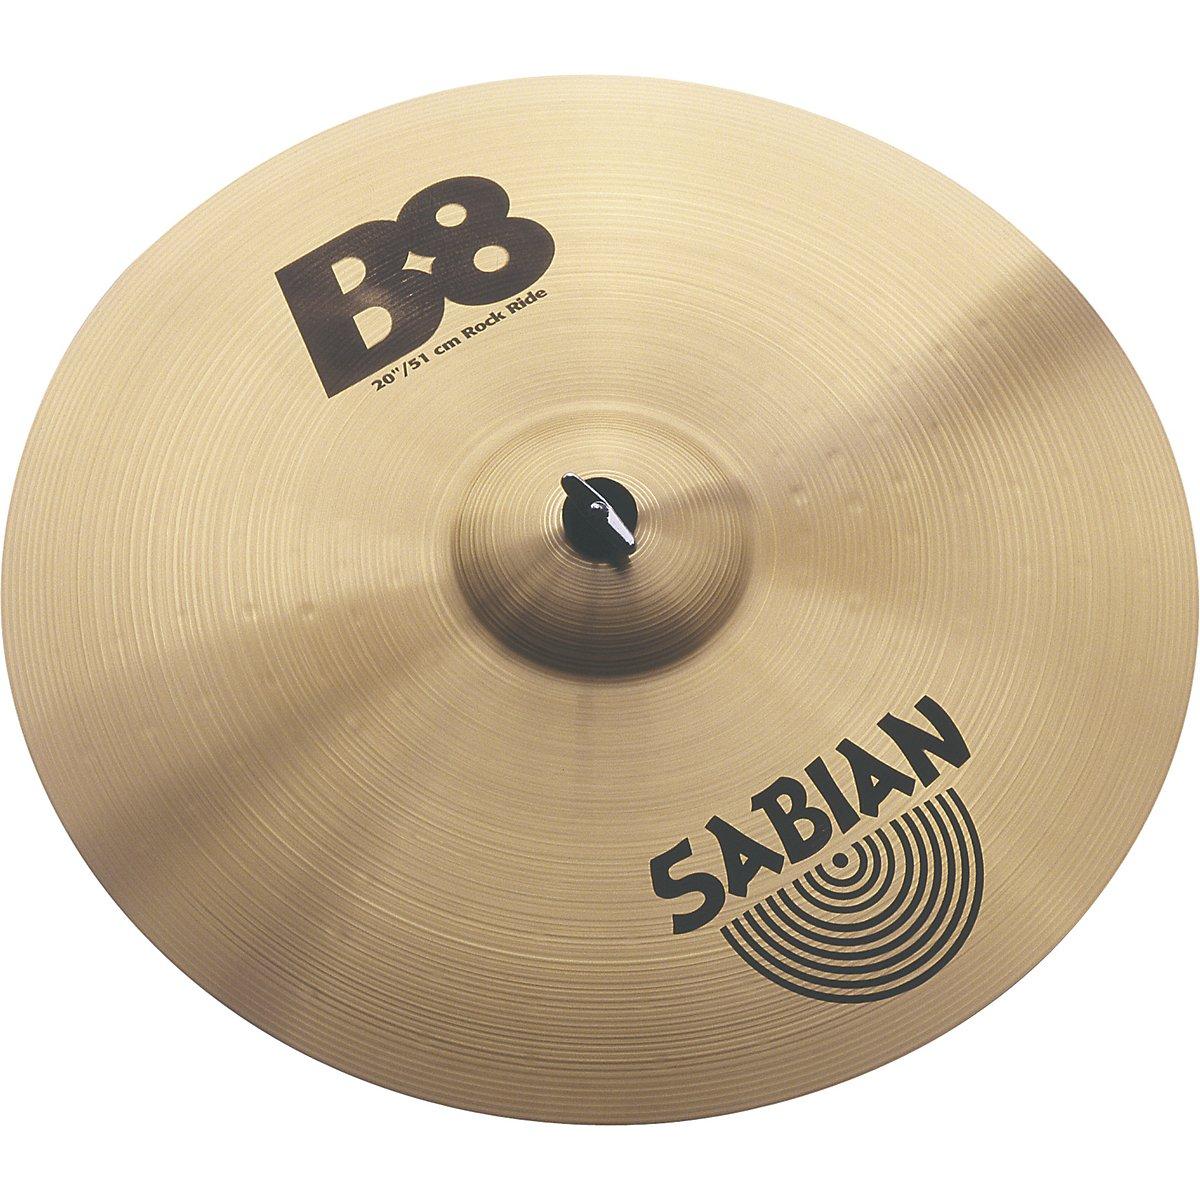 Sabian 20-inch Rock Ride B8 Cymbal Sabian Inc. 42014